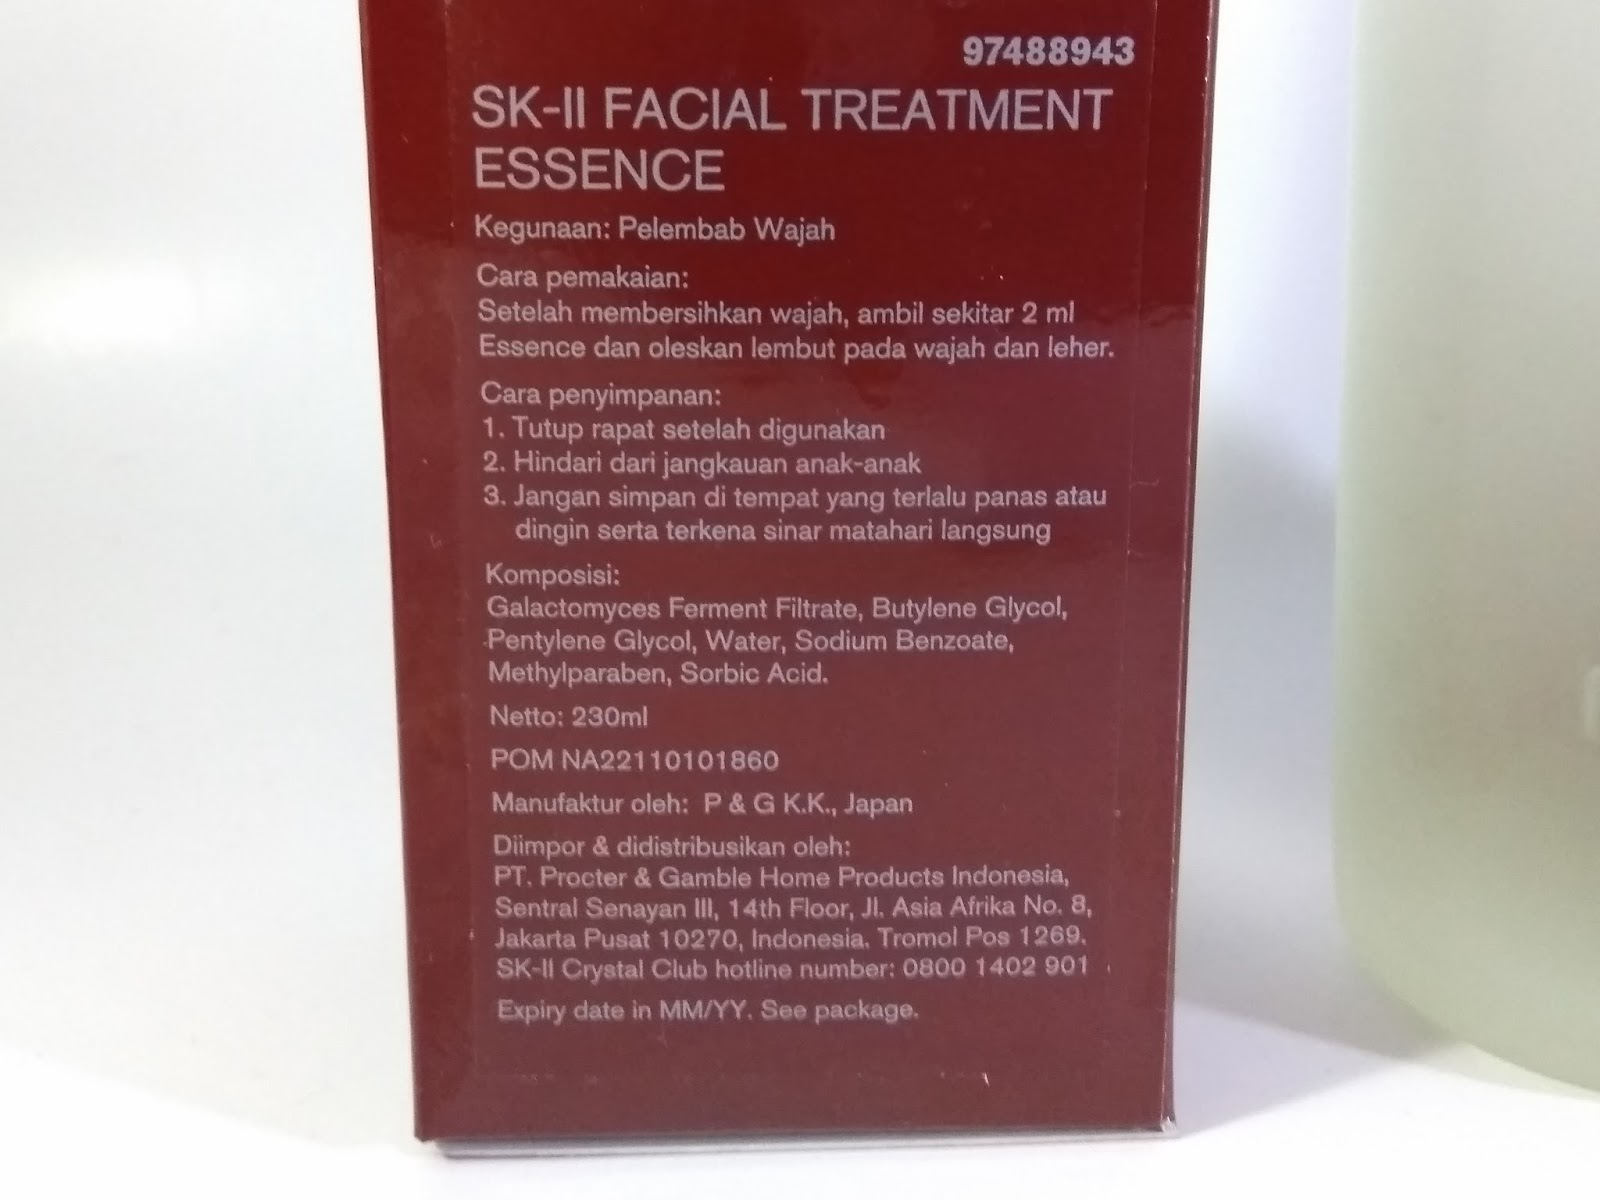 Sk Ii Facial Treatment Essence Review Fransiska Wenda Blog Fte 230ml Description